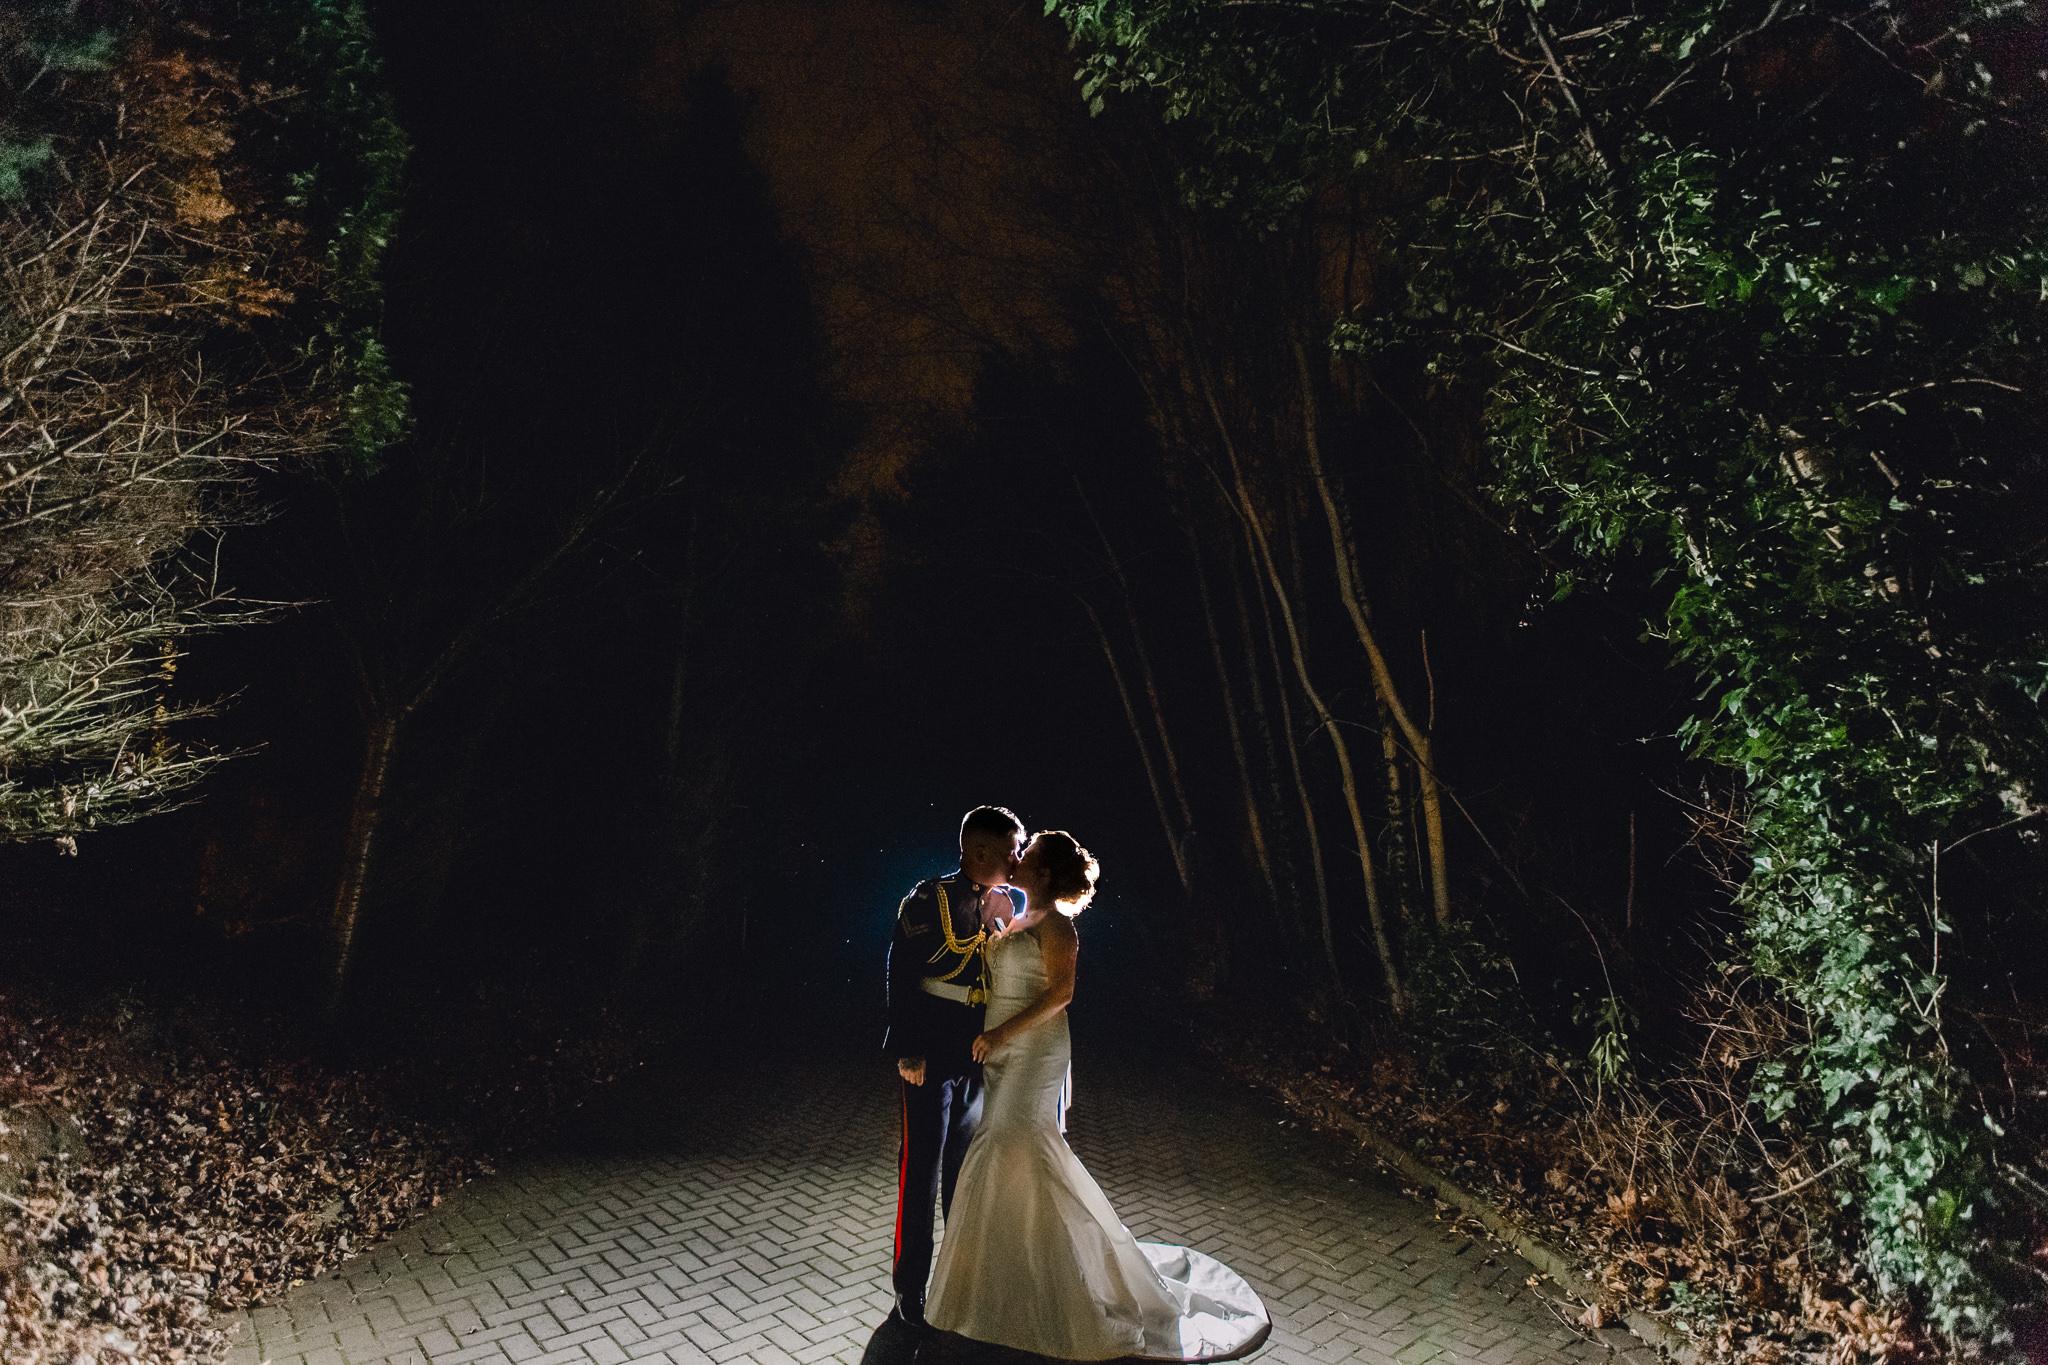 Mollingtonbanastre_wedding-20.jpg